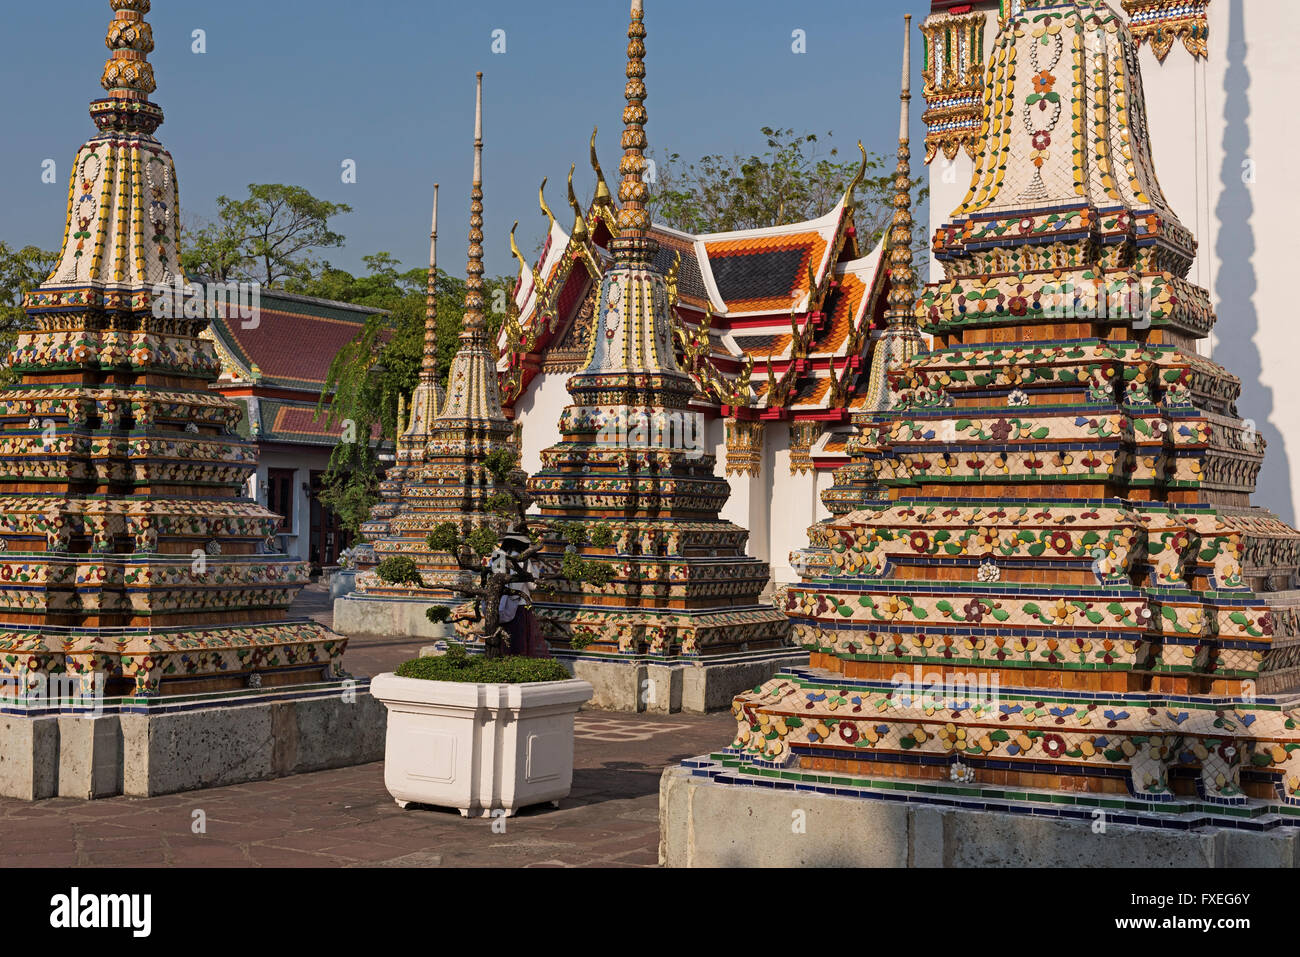 Wat Pho Bangkok Thaïlande Photo Stock